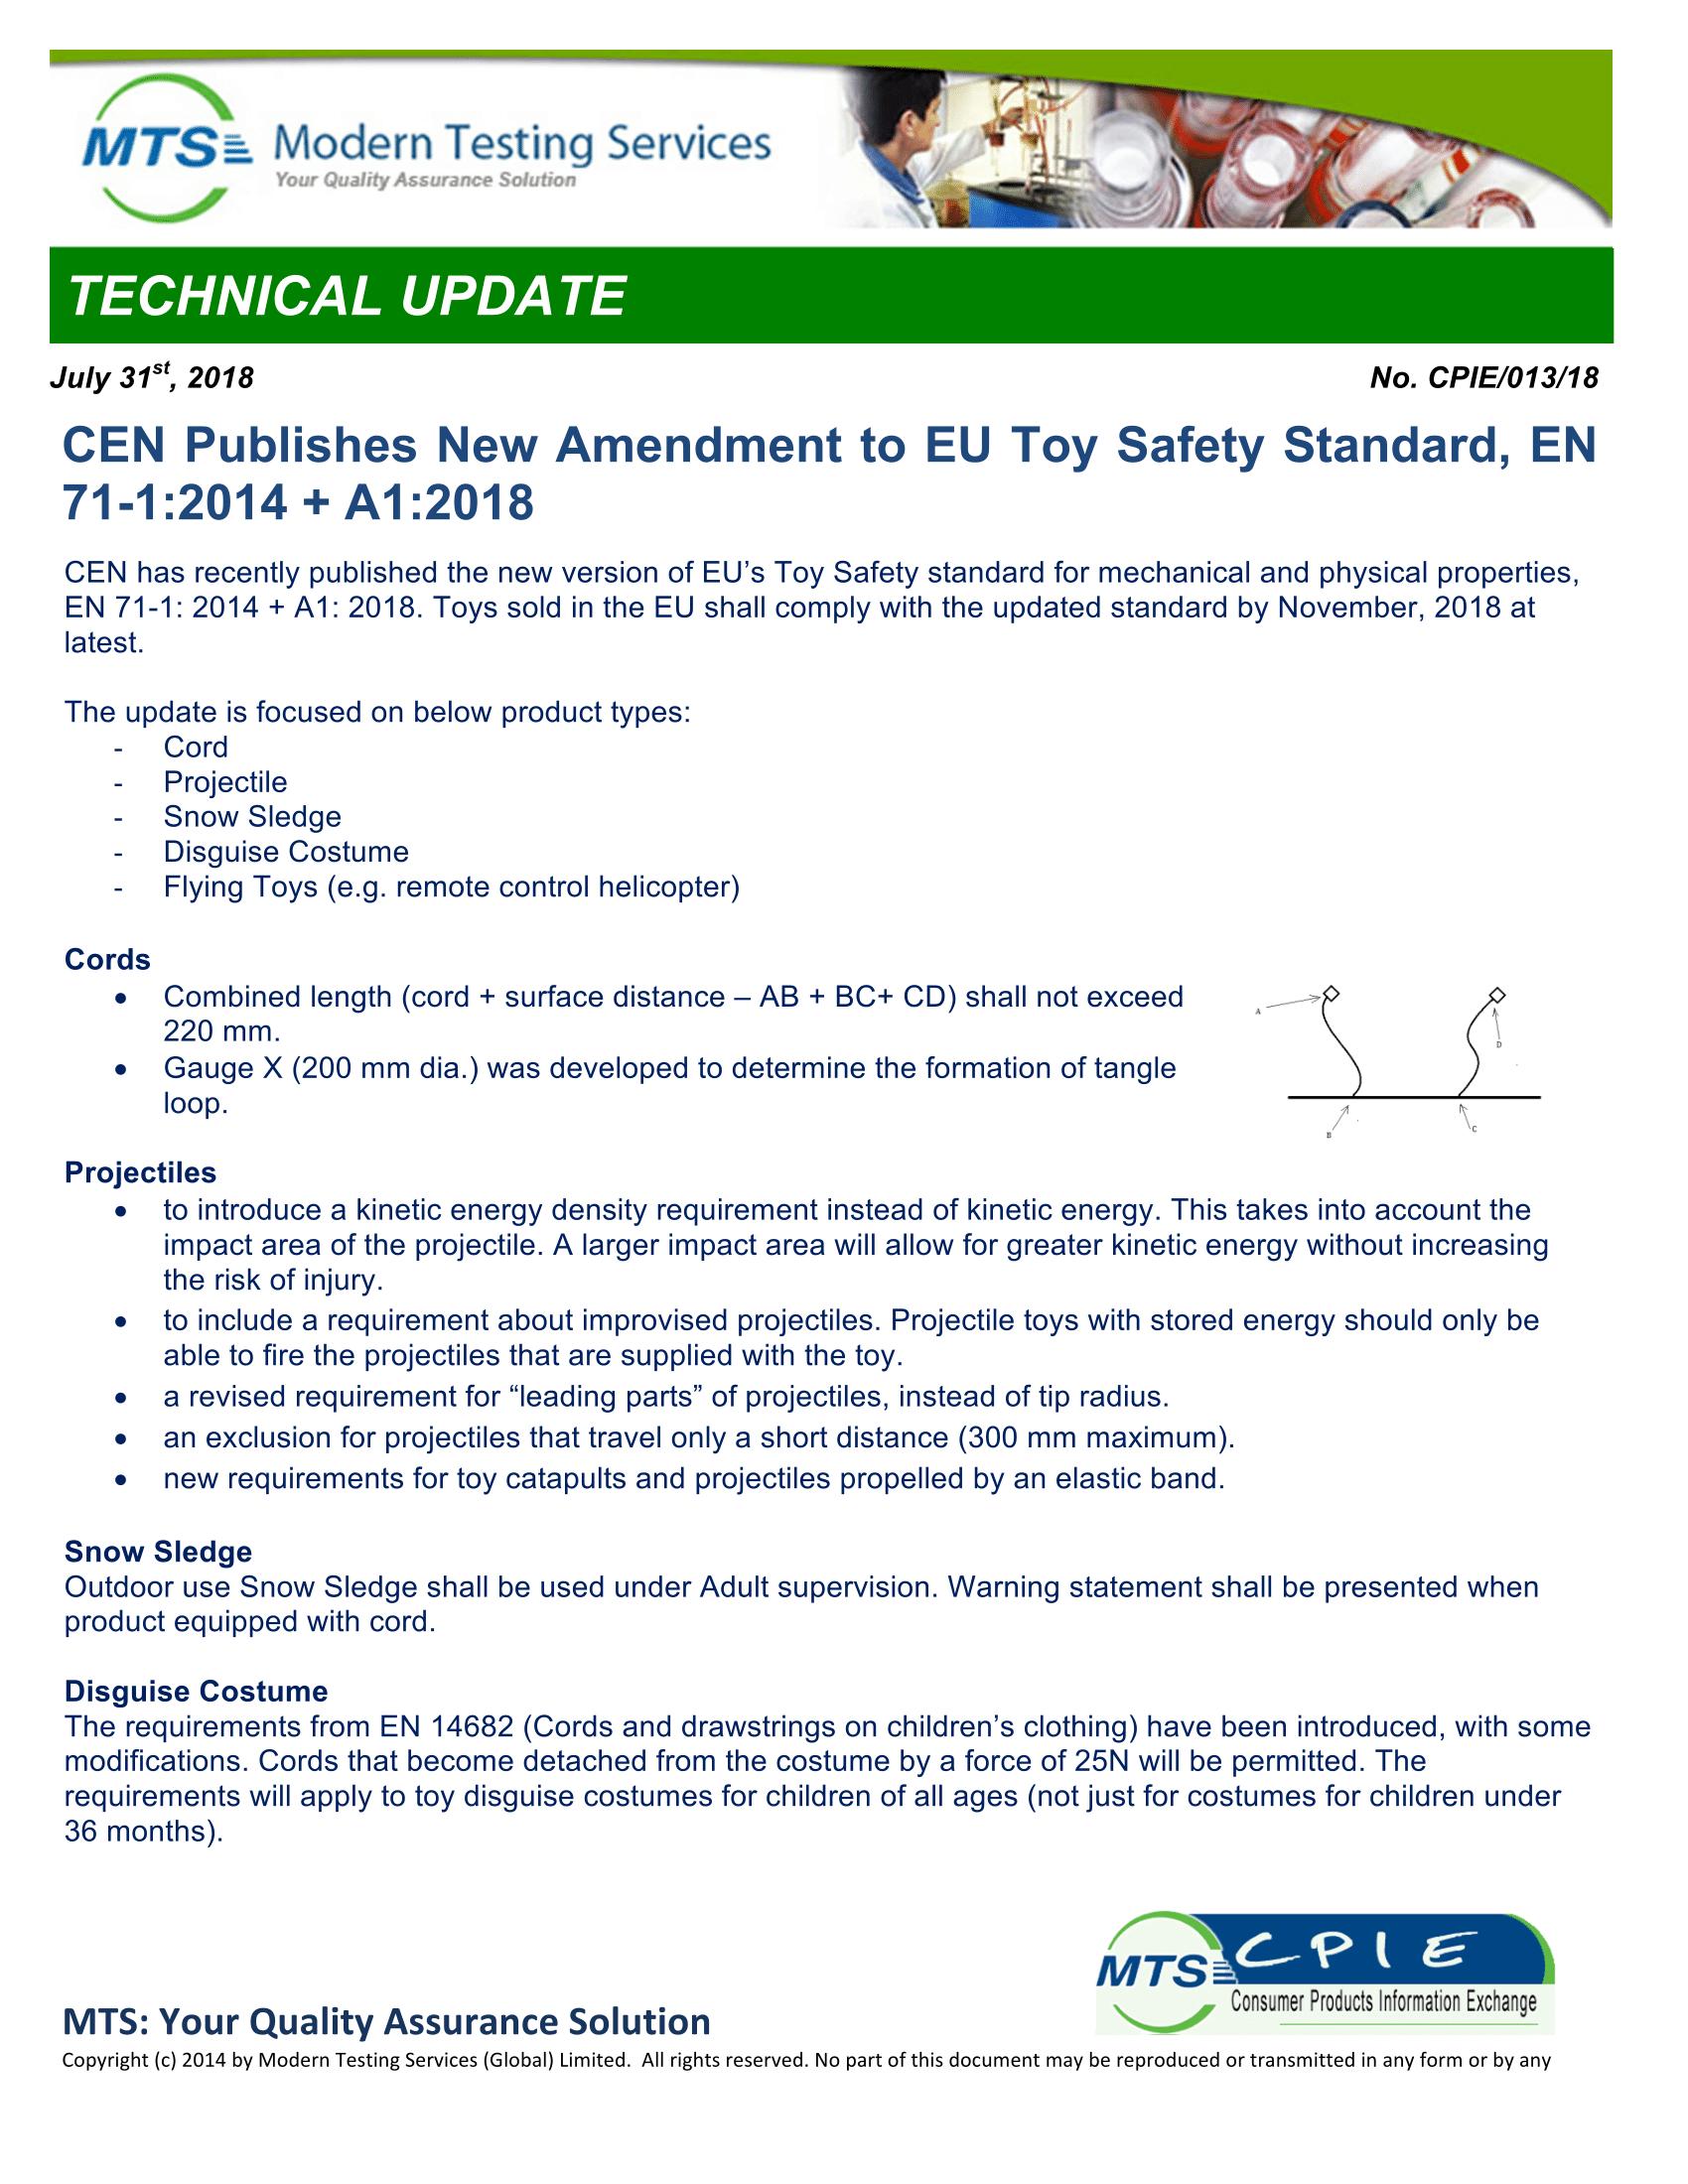 CPIE-013-18 CEN Publishes New Amendment to EU Toy Safety Standard EN 71-1-2014  A1-2018-1